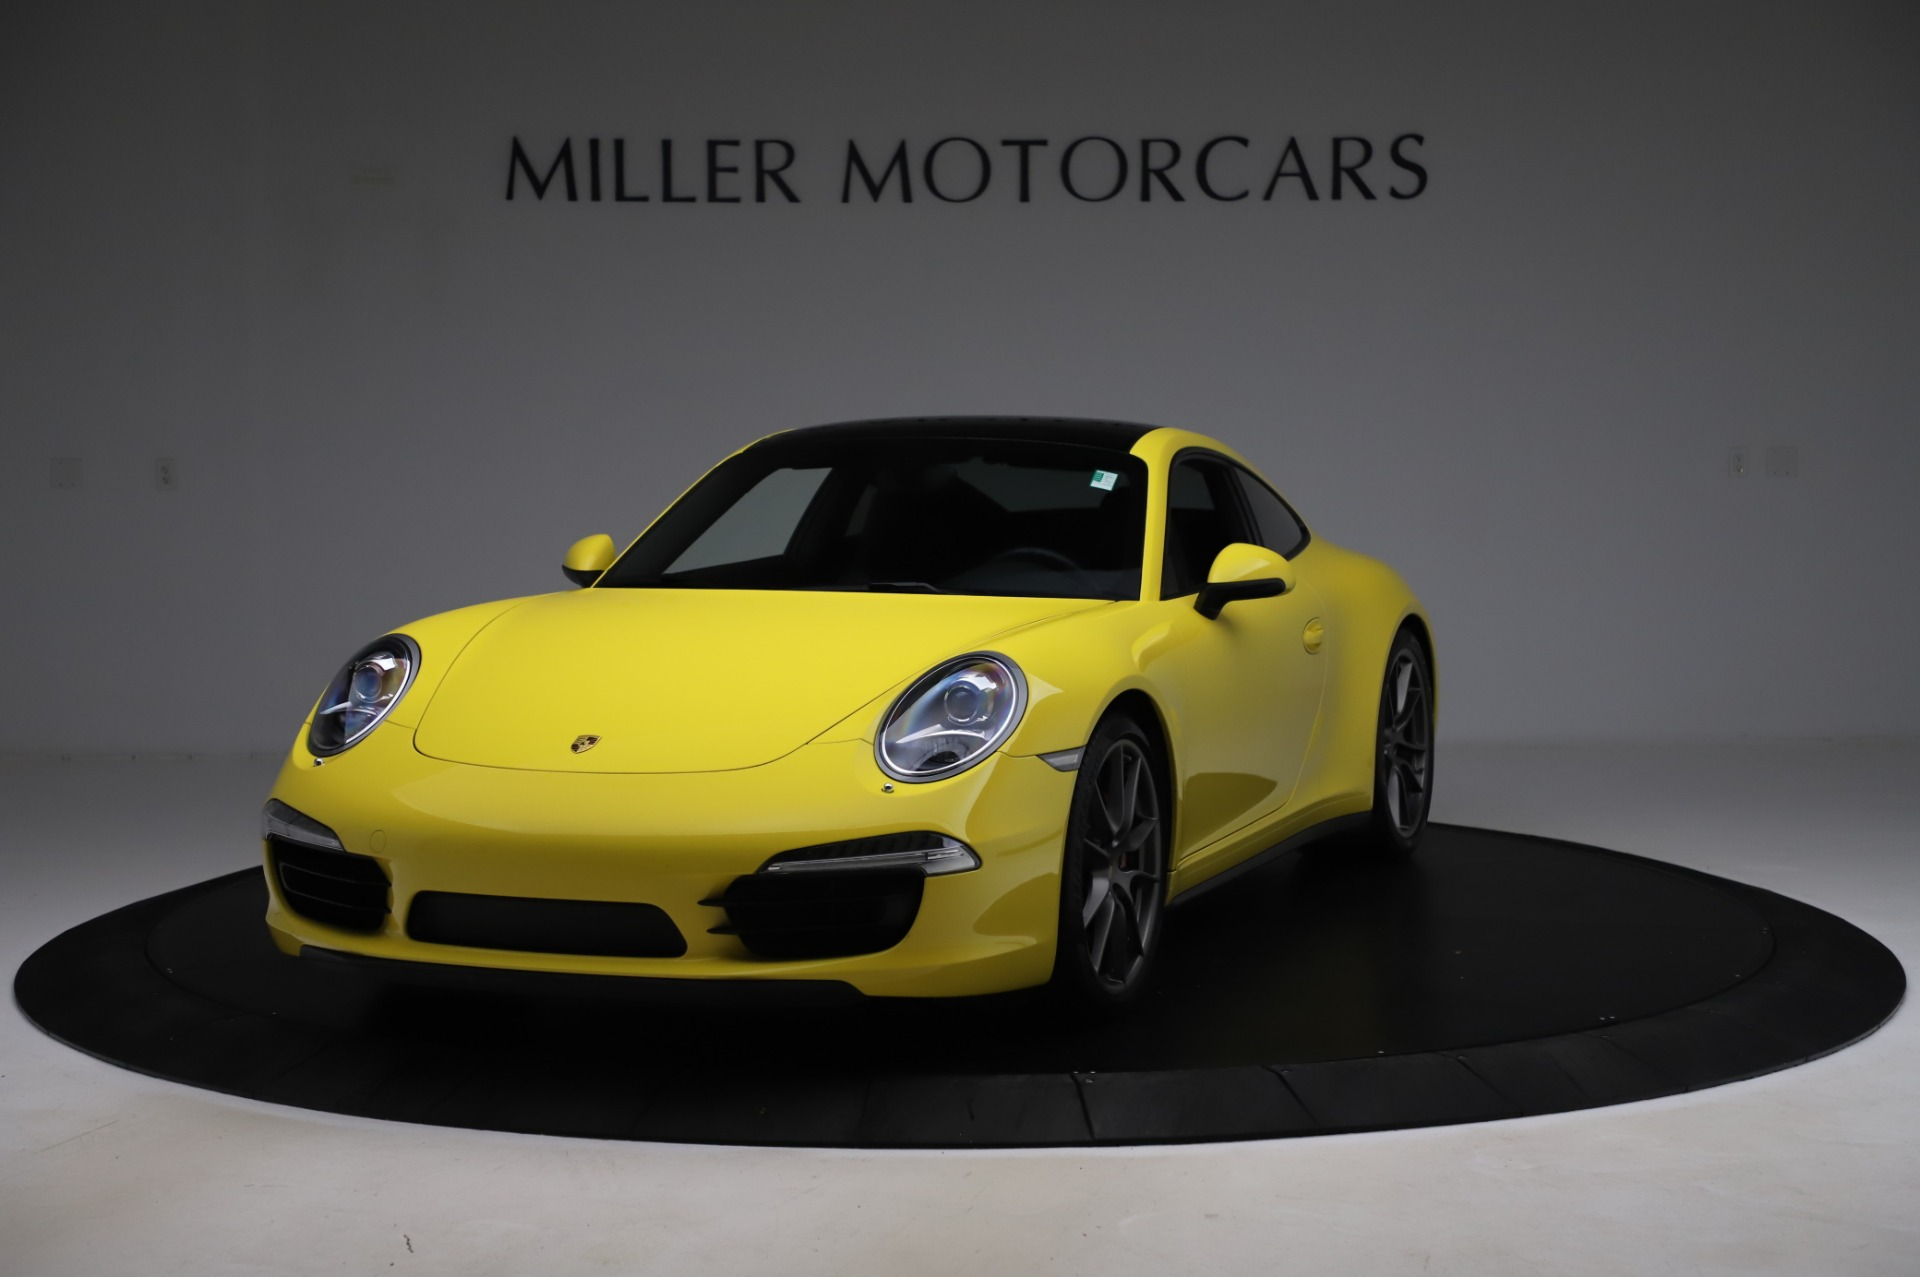 Used 2013 Porsche 911 Carrera 4S for sale $74,900 at Maserati of Westport in Westport CT 06880 1